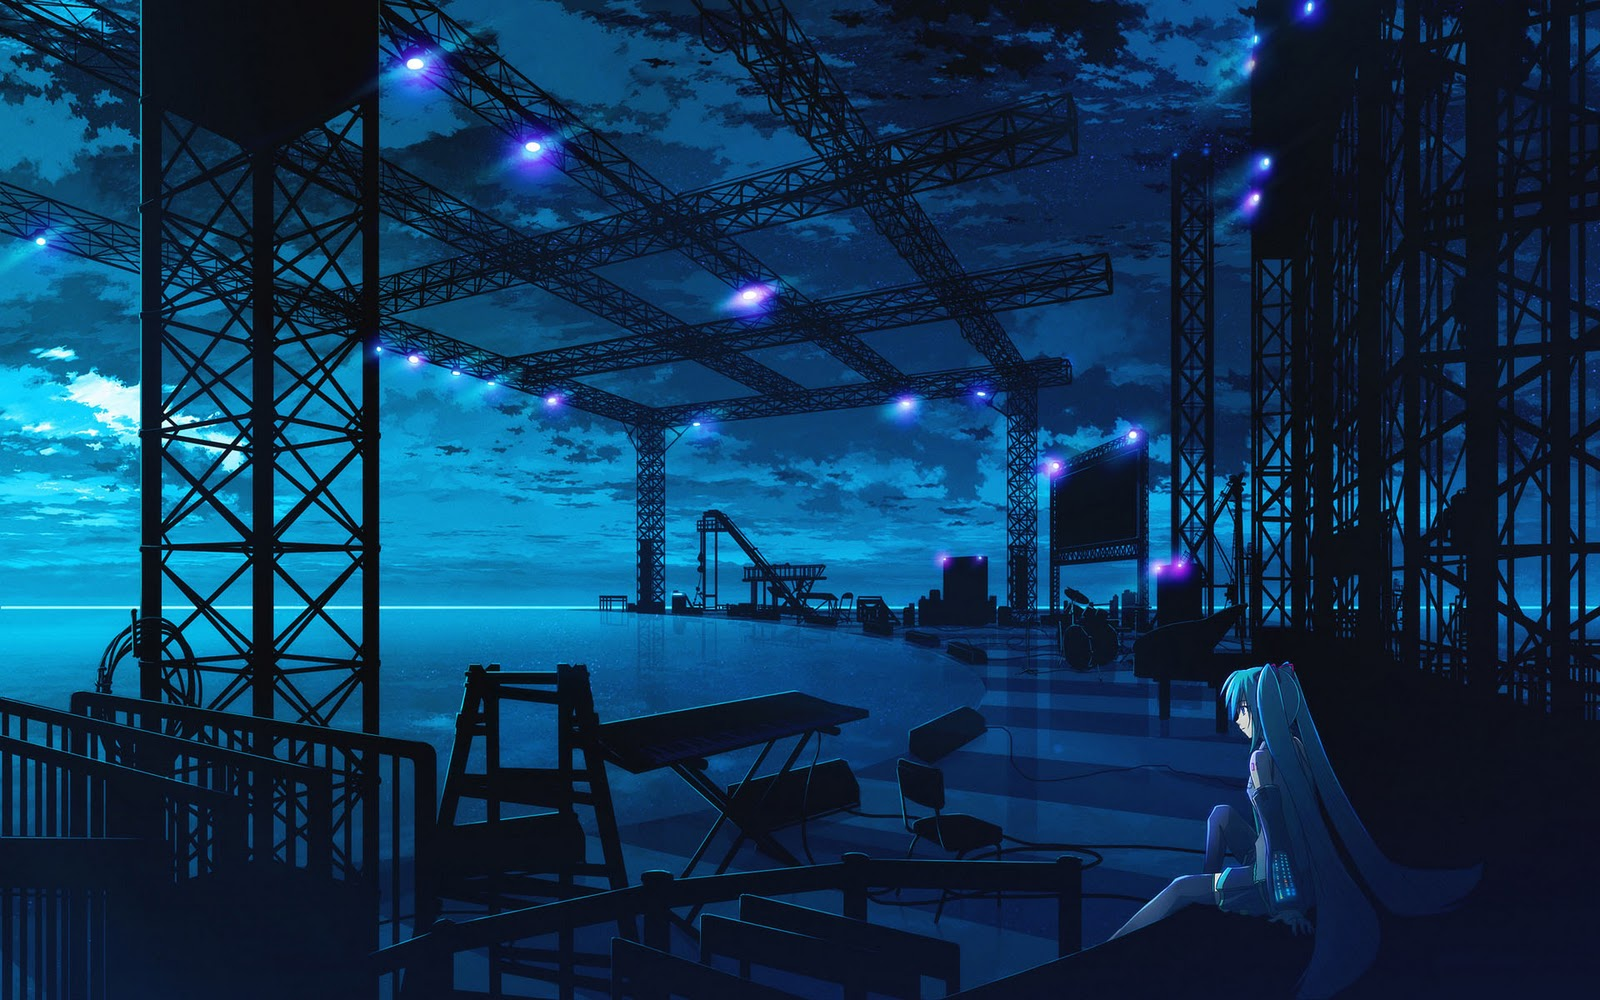 anime landscape hatsune miku - photo #8